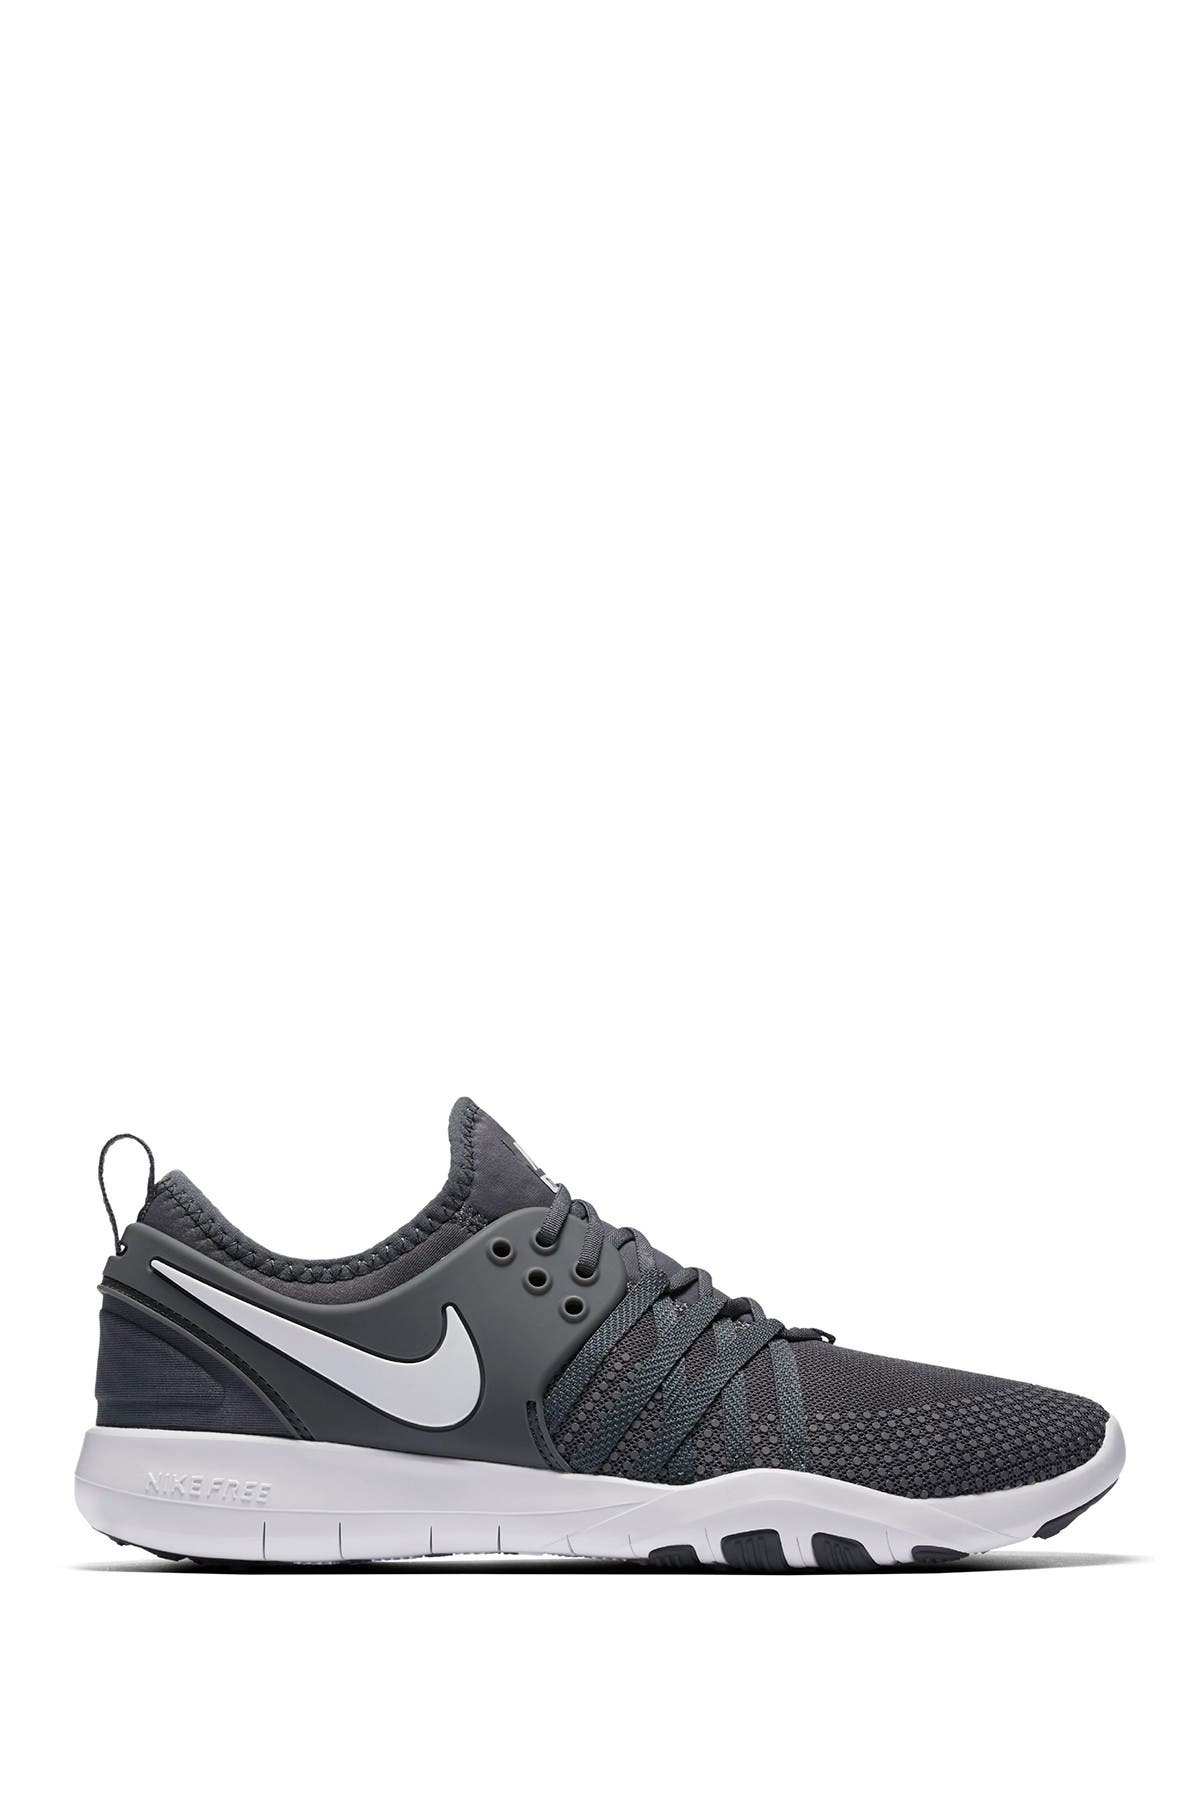 Nike | Free TR 7 Training Sneaker